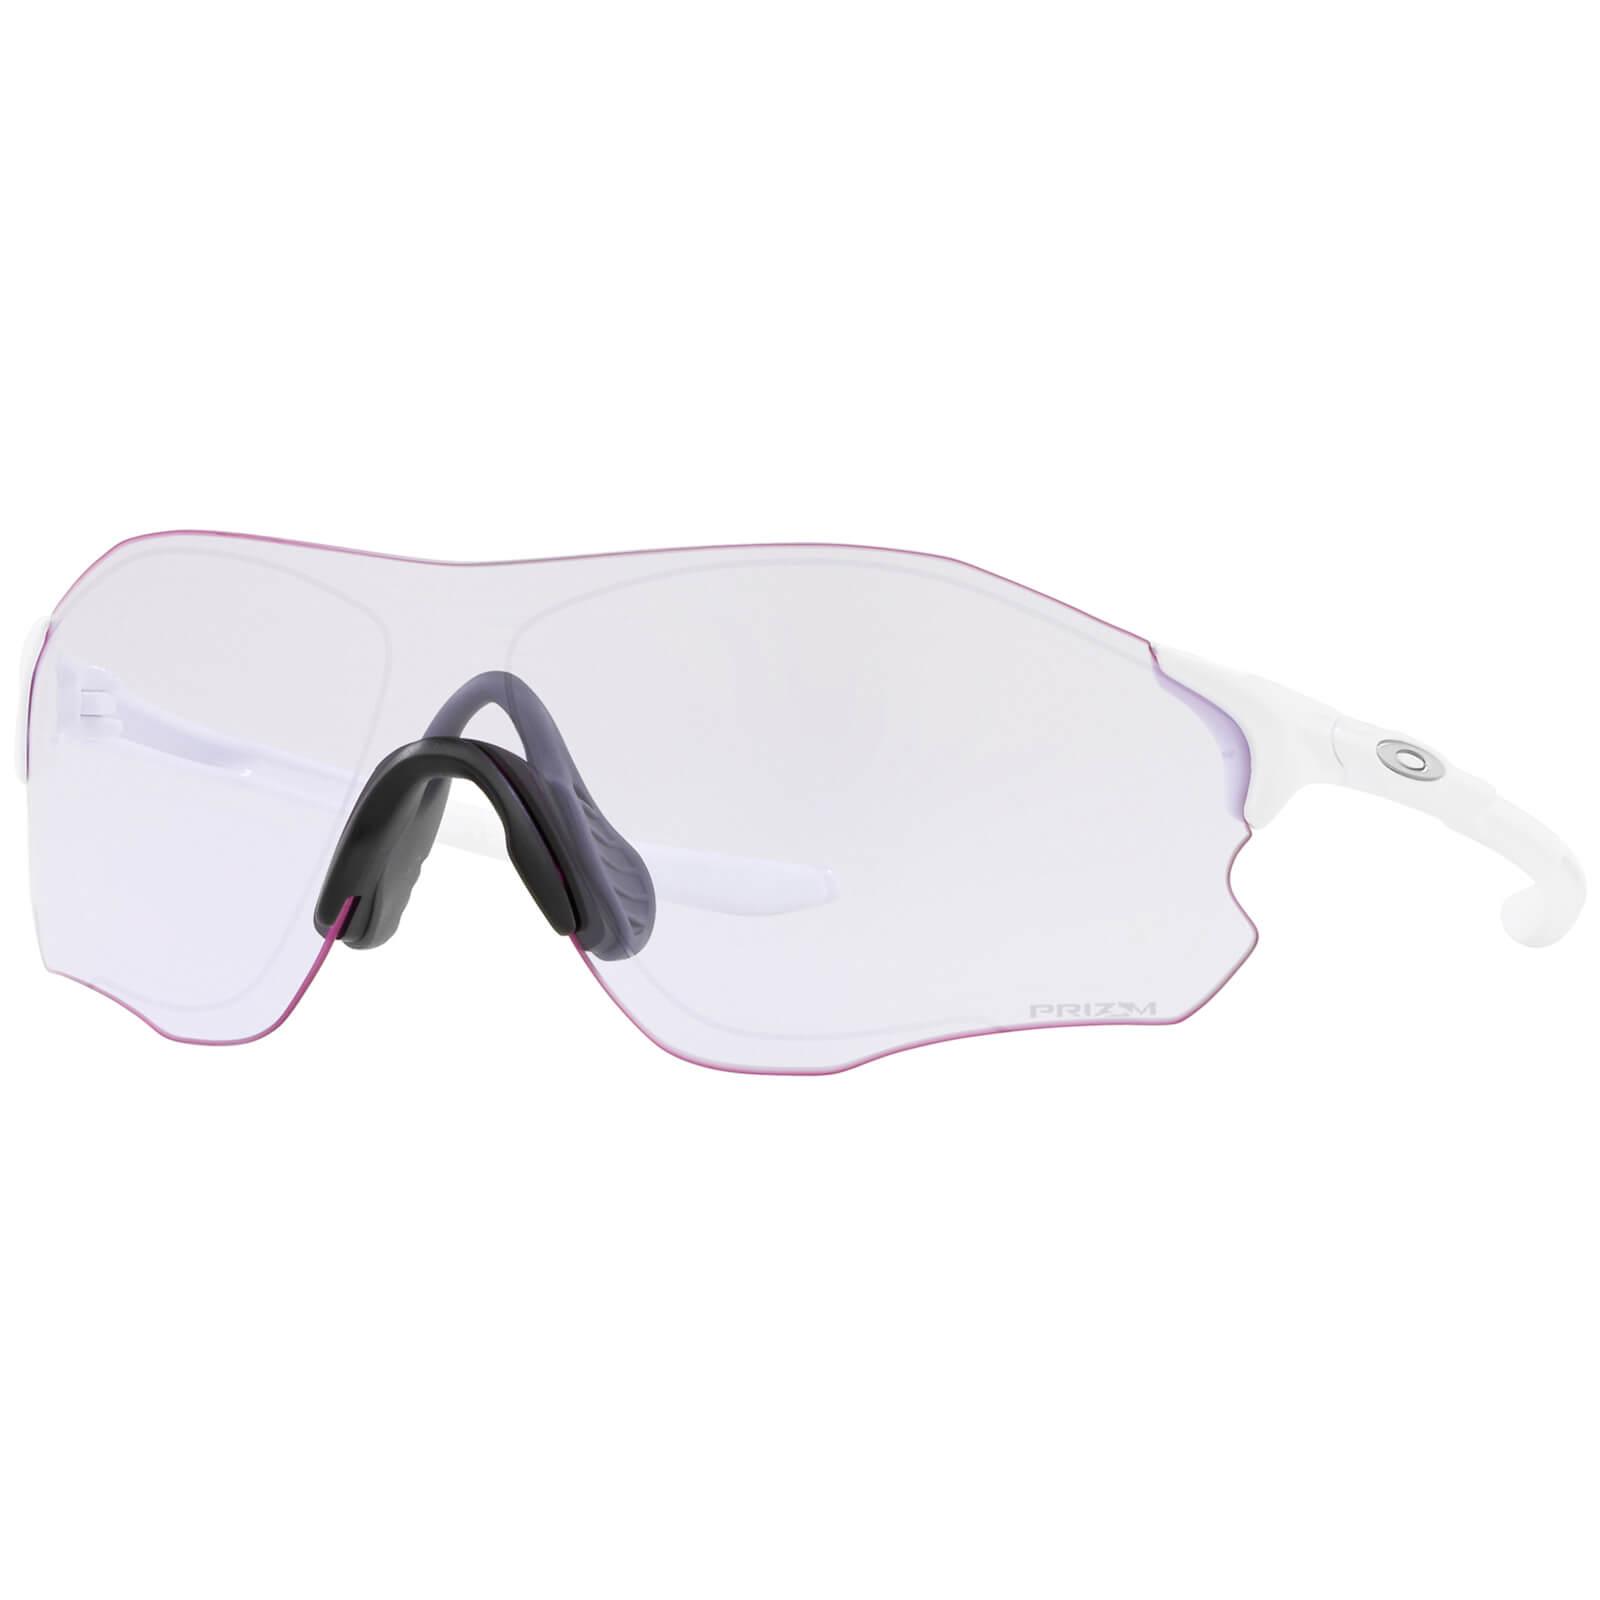 0d4a3c7560692 Oakley EV Zero Path Sunglasses - Polished White Prizm Low Light ...